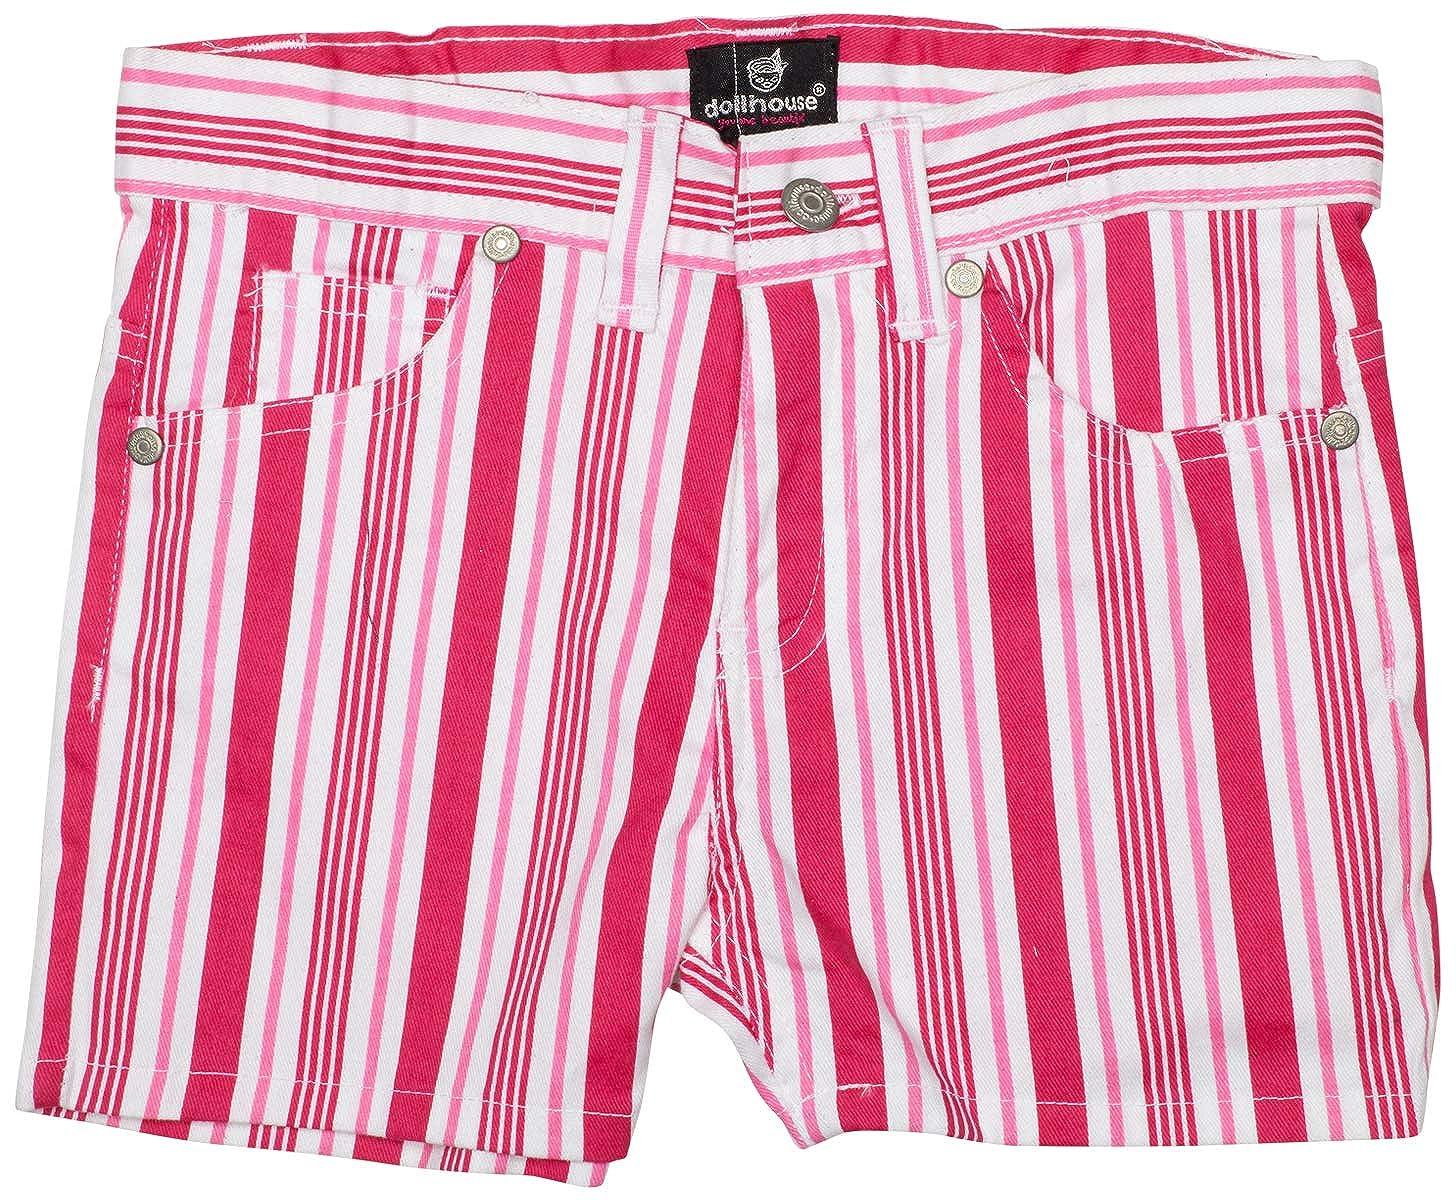 dollhouse Girls/' 2-Piece Denim Shorts Set